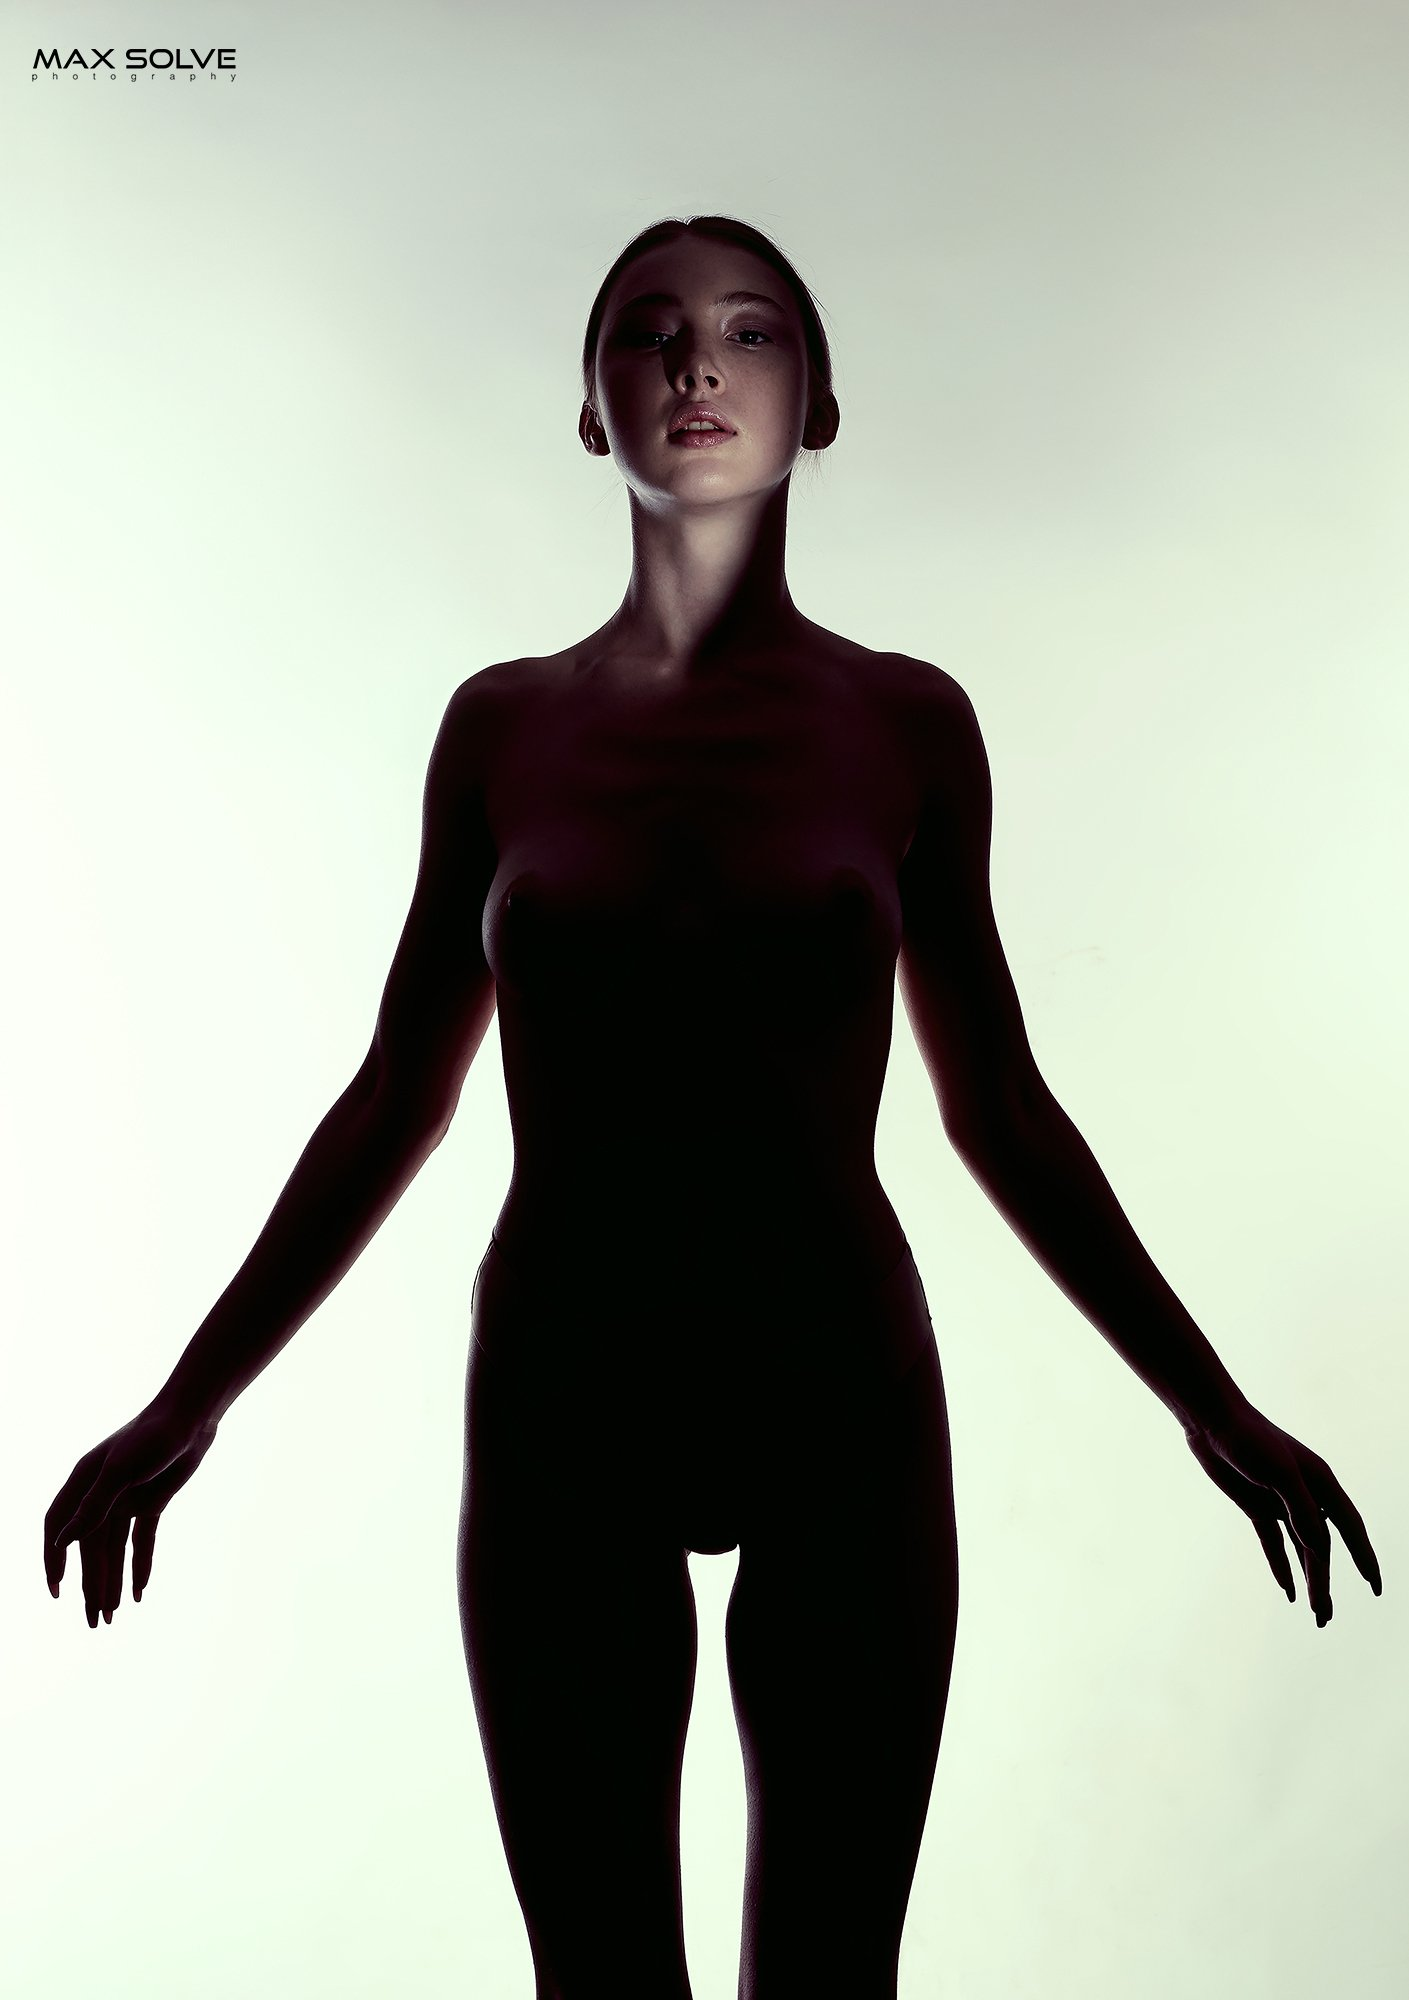 fashion, model, models, girl, nude, woman, art, dark, shadows, light, sexy, , Max Solve